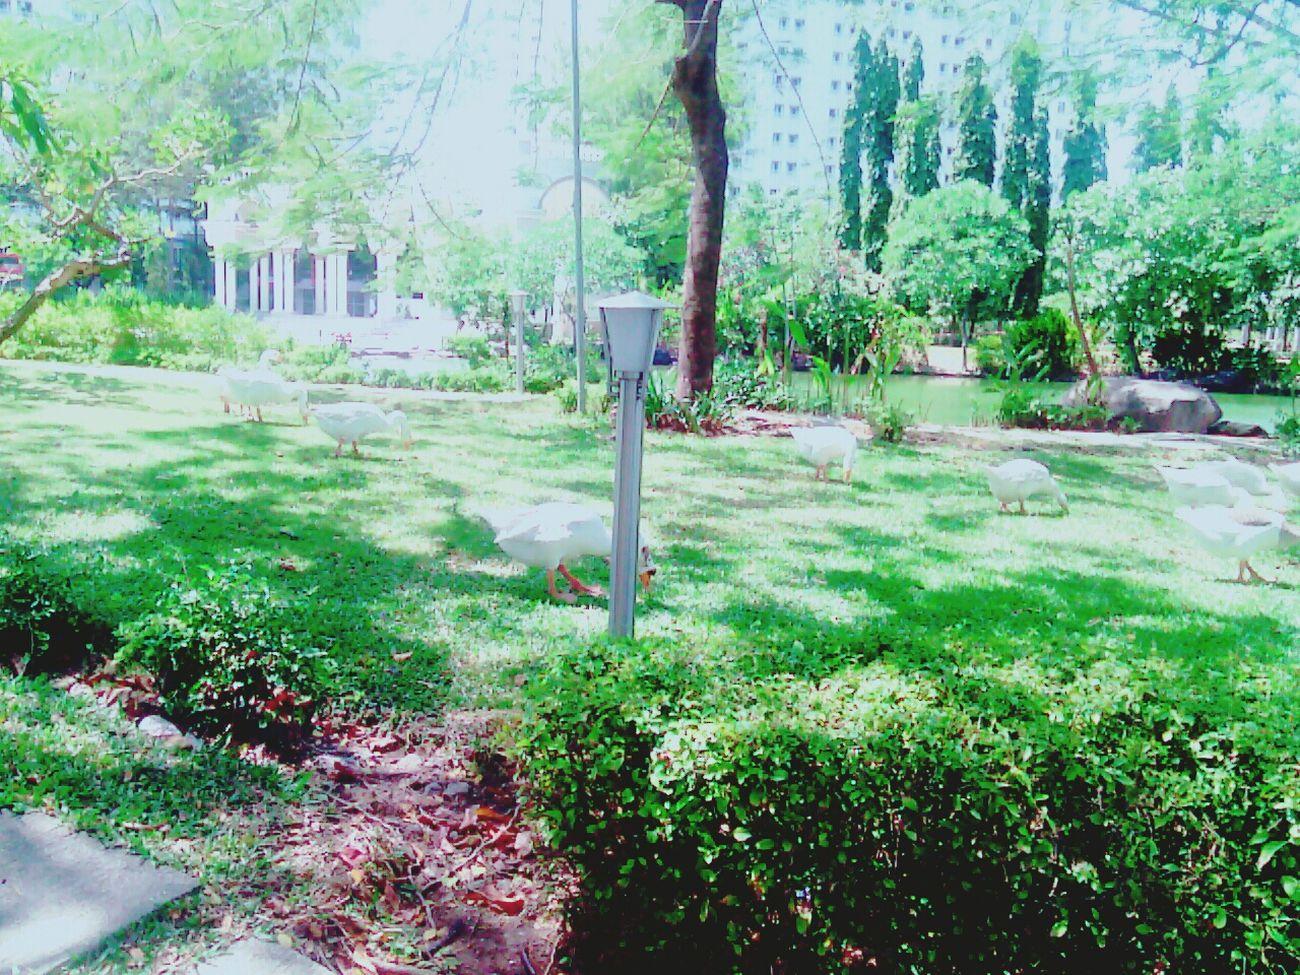 This is surabaya . banyak angsa. bagus kan? hahaha.... Surabaya Angsa Relex Asaljepret Enjoying Life Love ♥ HAHAHAHAHAHA